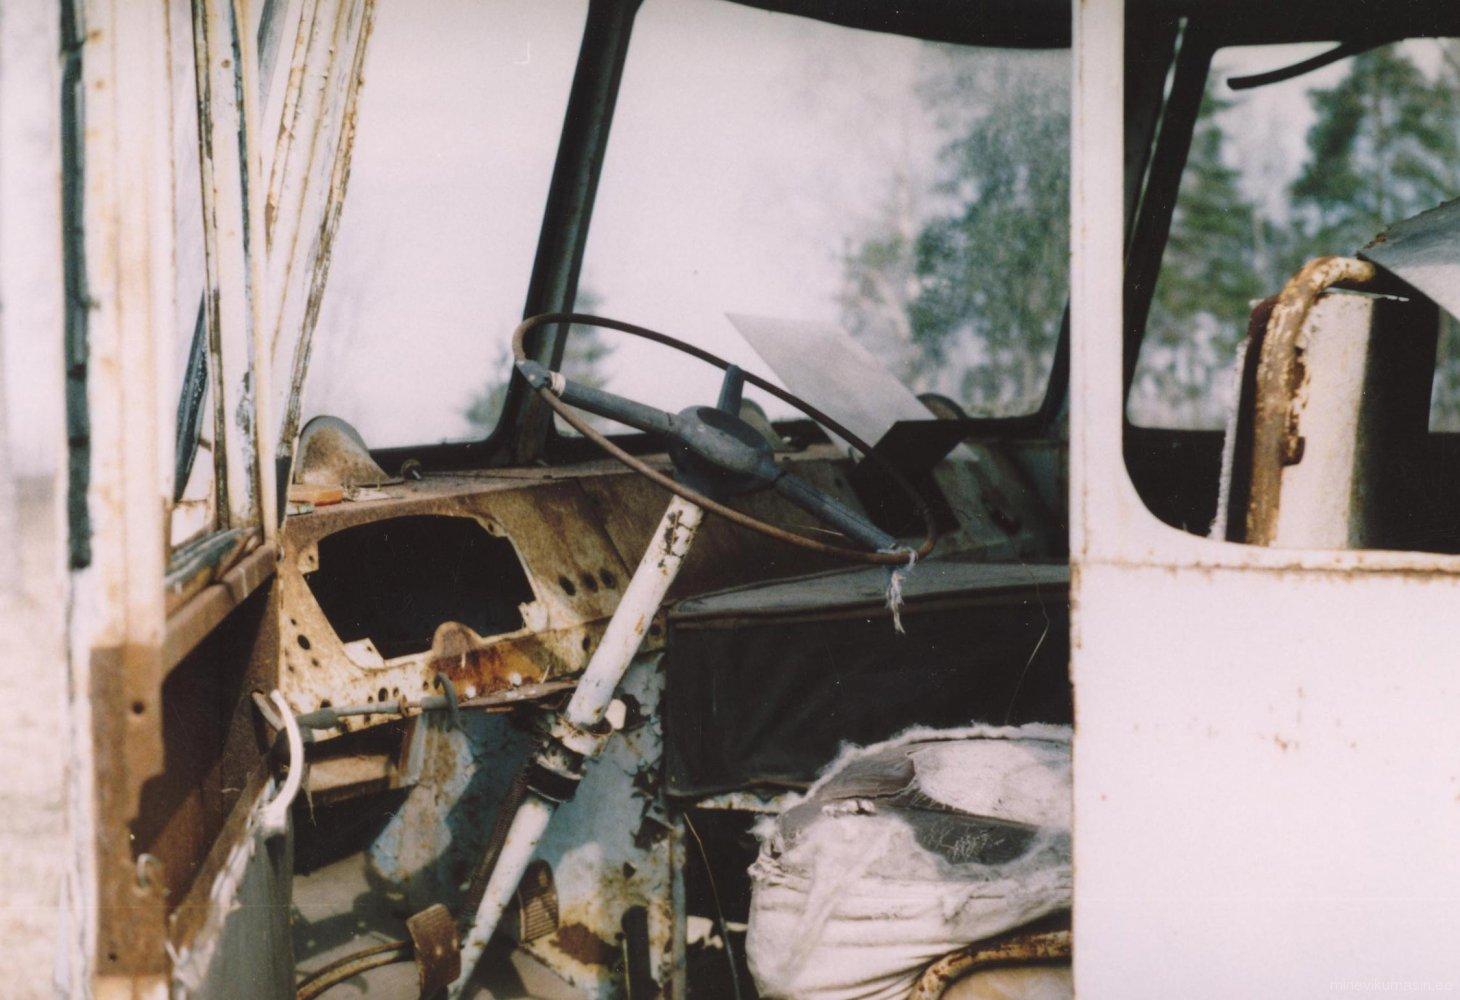 21.4.2004